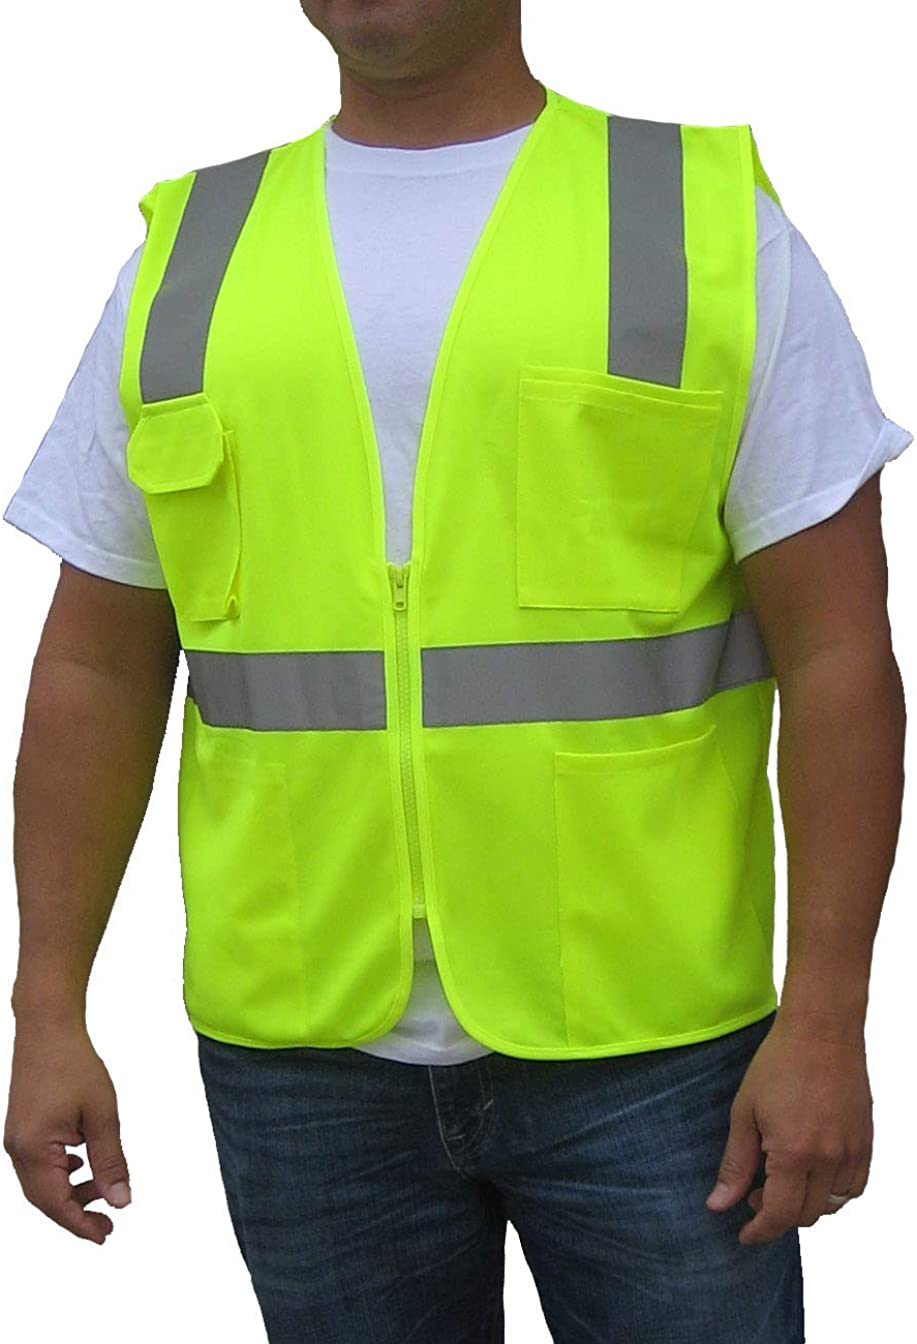 ANSI//ISEA Compliant 3C Products Class 2 Mens Safety Surveyor Vest NEON Orange